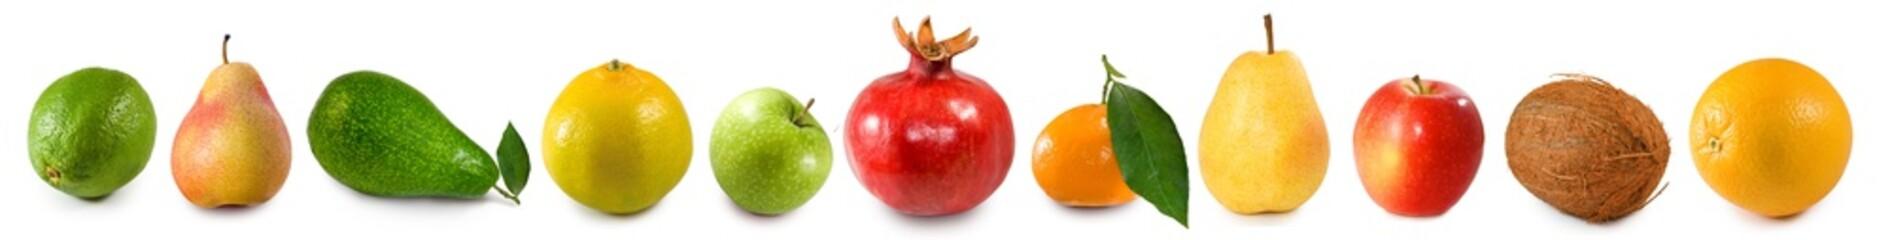 Fototapete - isolated image of a many fruit